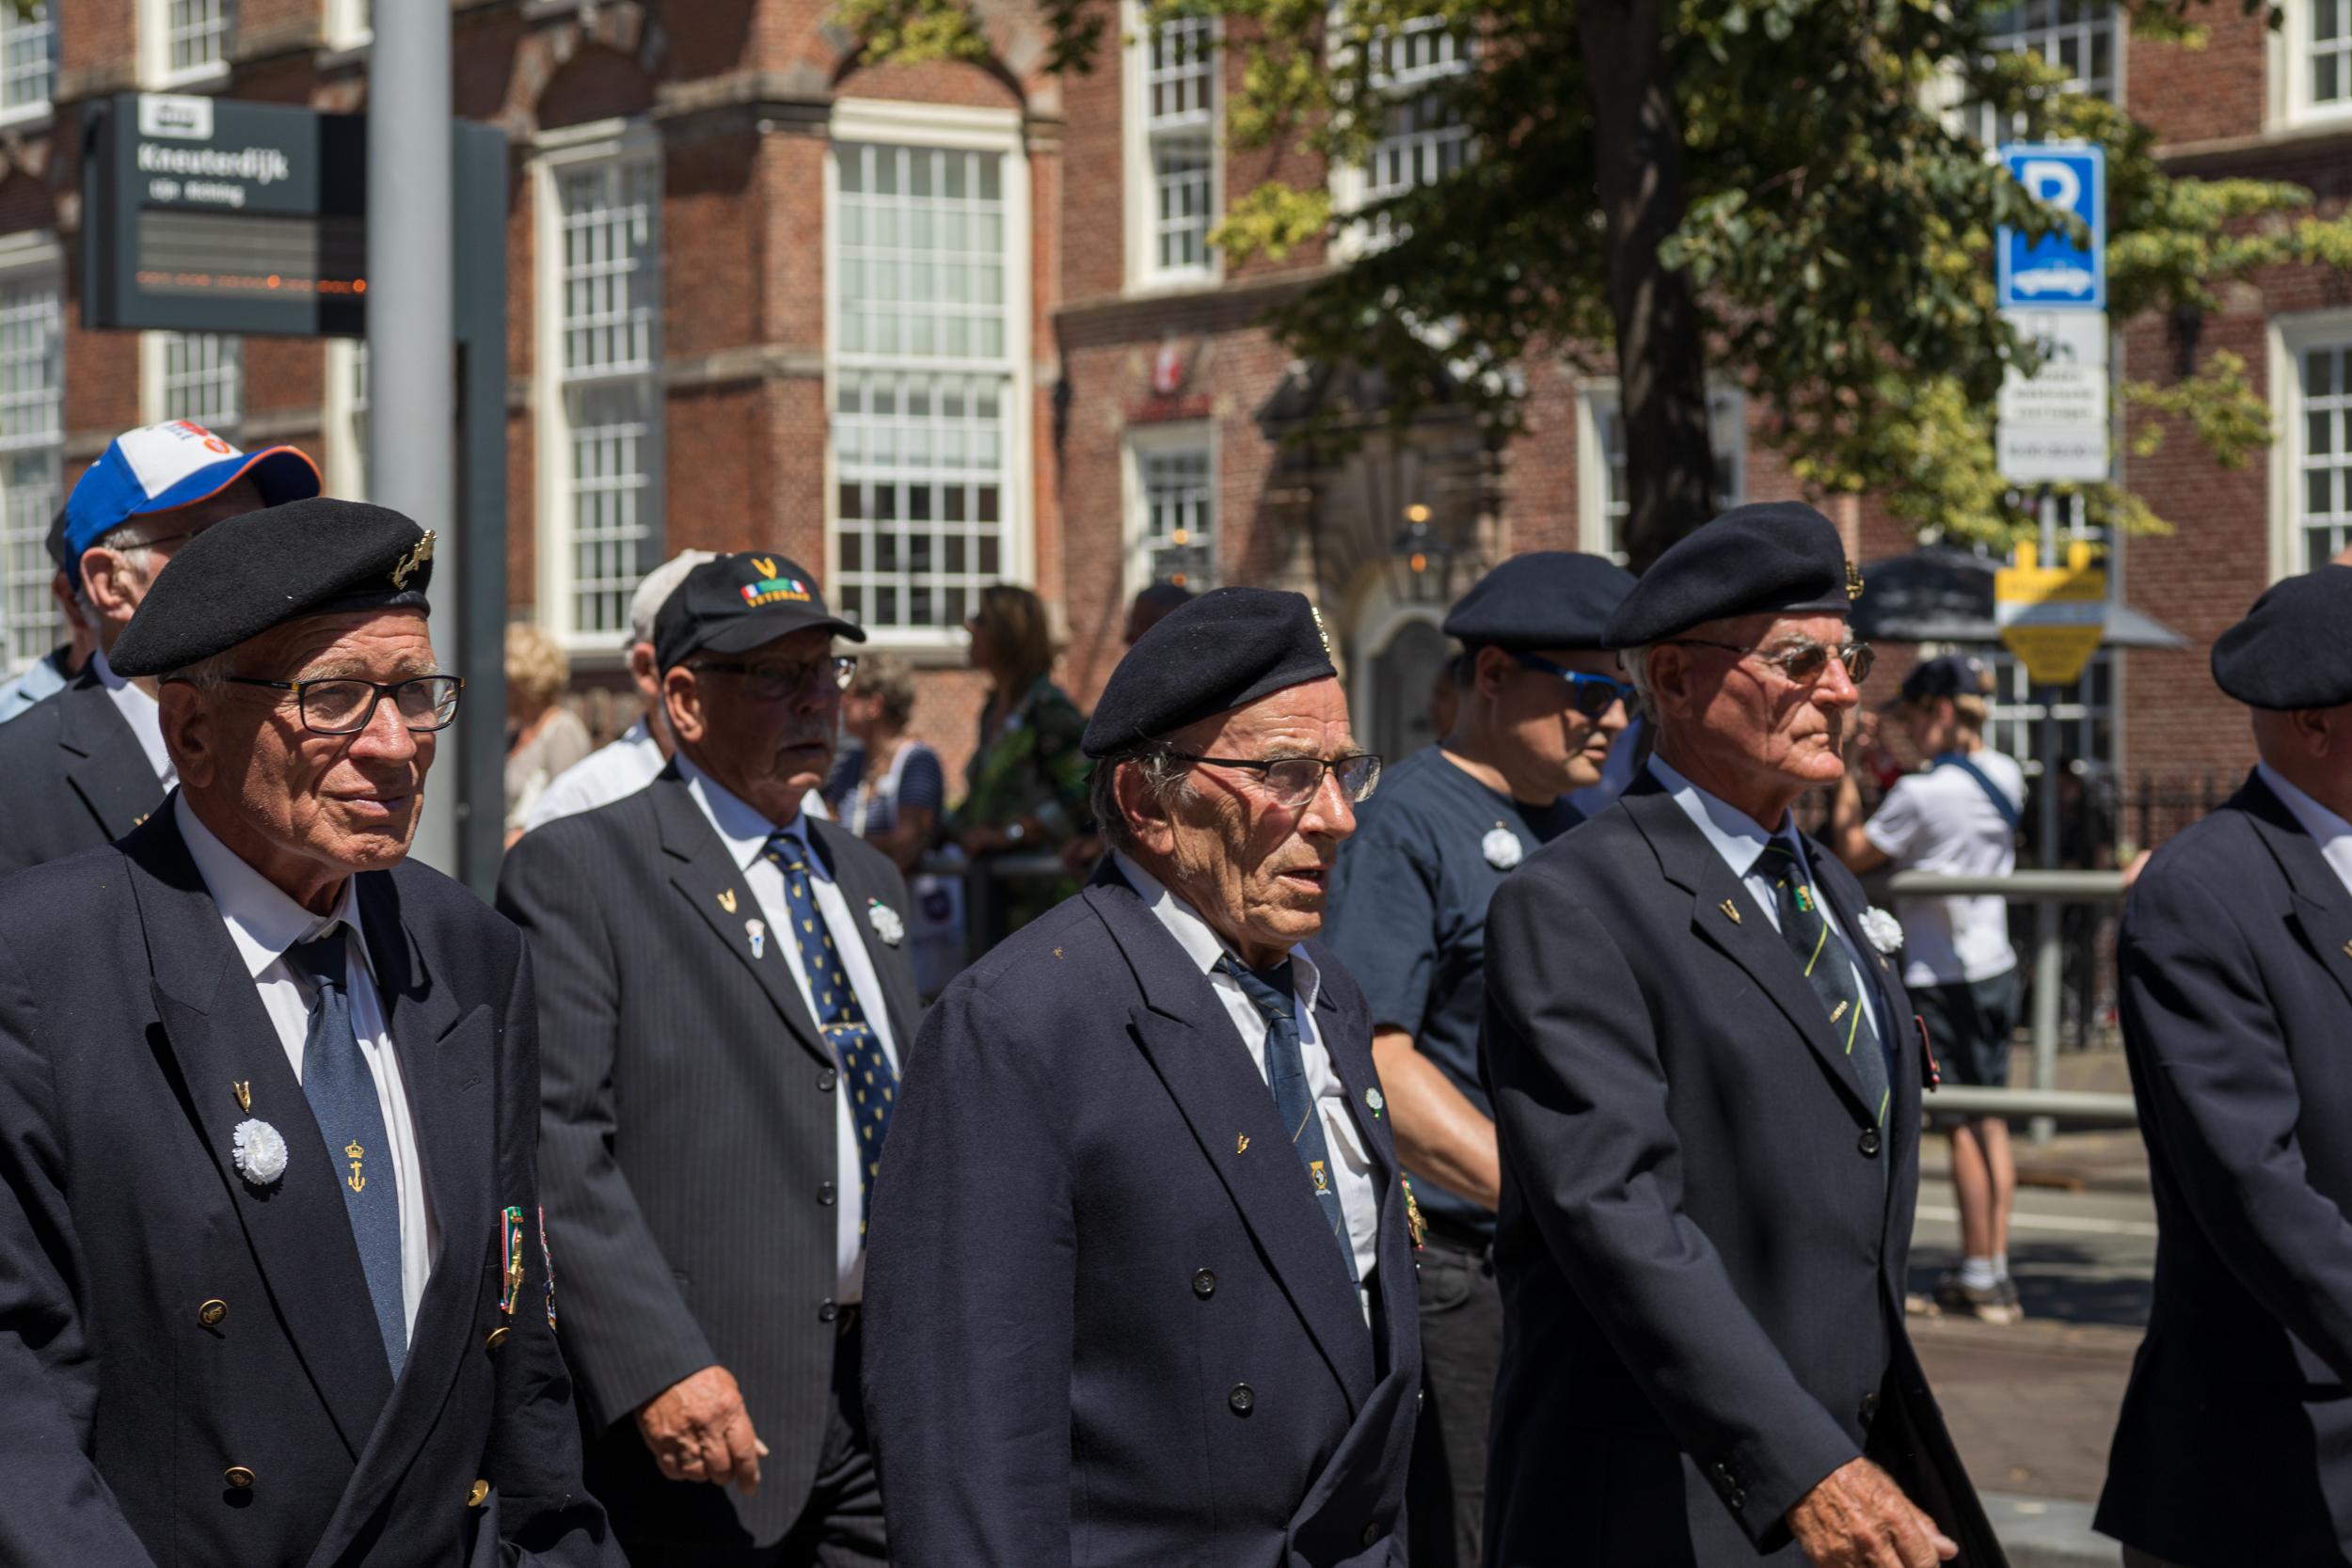 Veteranendag 2019 Kneuterdijk-8.jpg